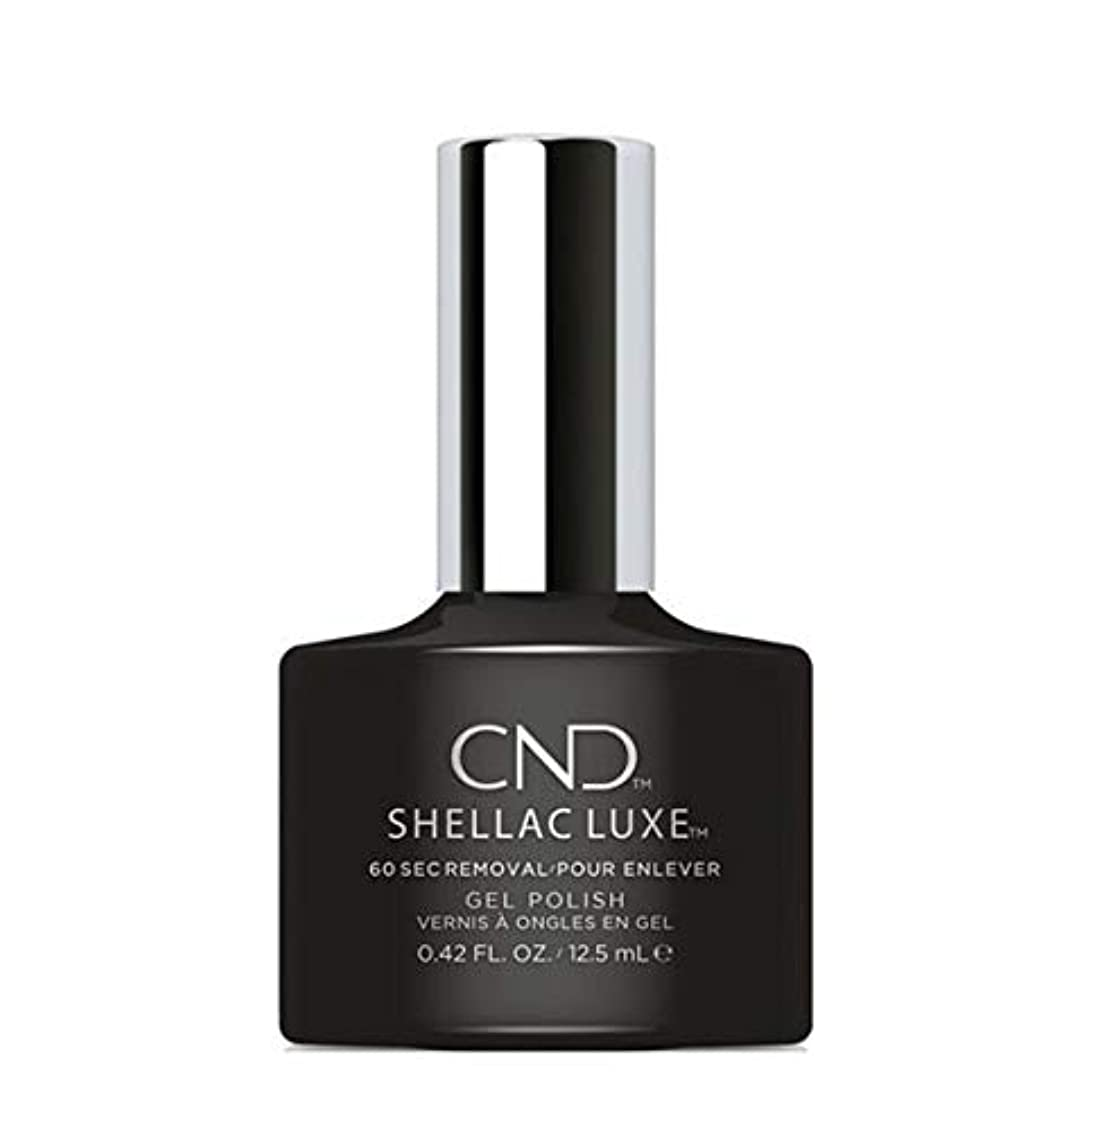 抵抗淡い原理CND Shellac Luxe - Black Pool - 12.5 ml / 0.42 oz